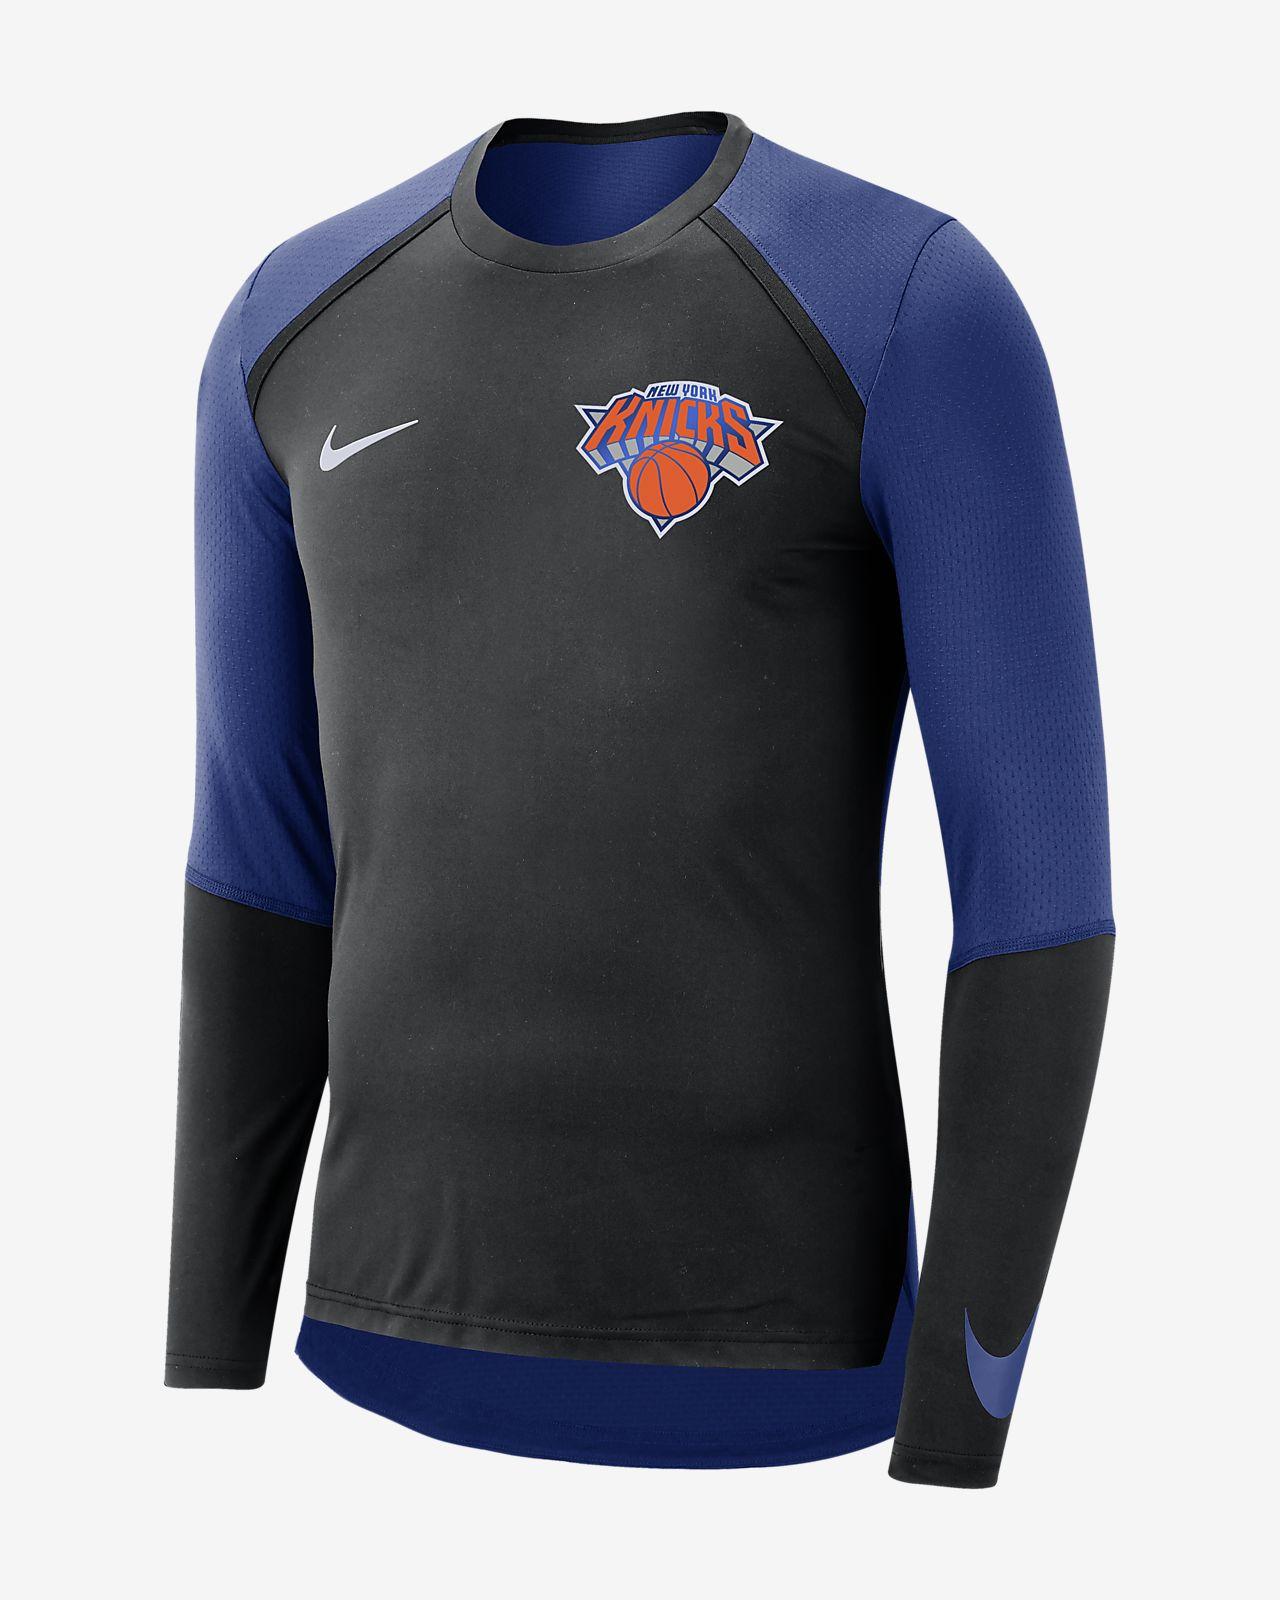 New York Knicks Nike Dri-FIT Men's Long-Sleeve NBA Top